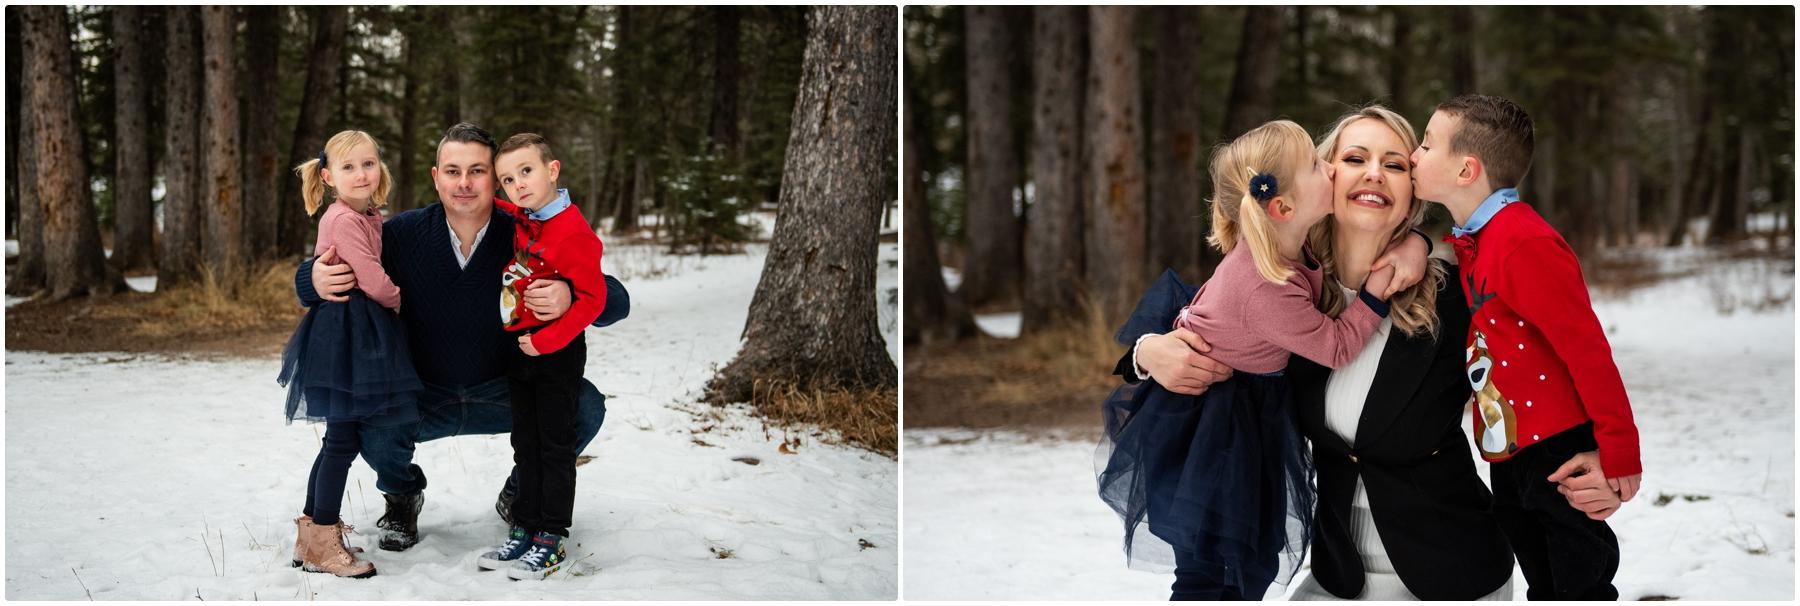 Calgary Winter Family Photographers- Fish Creek Park